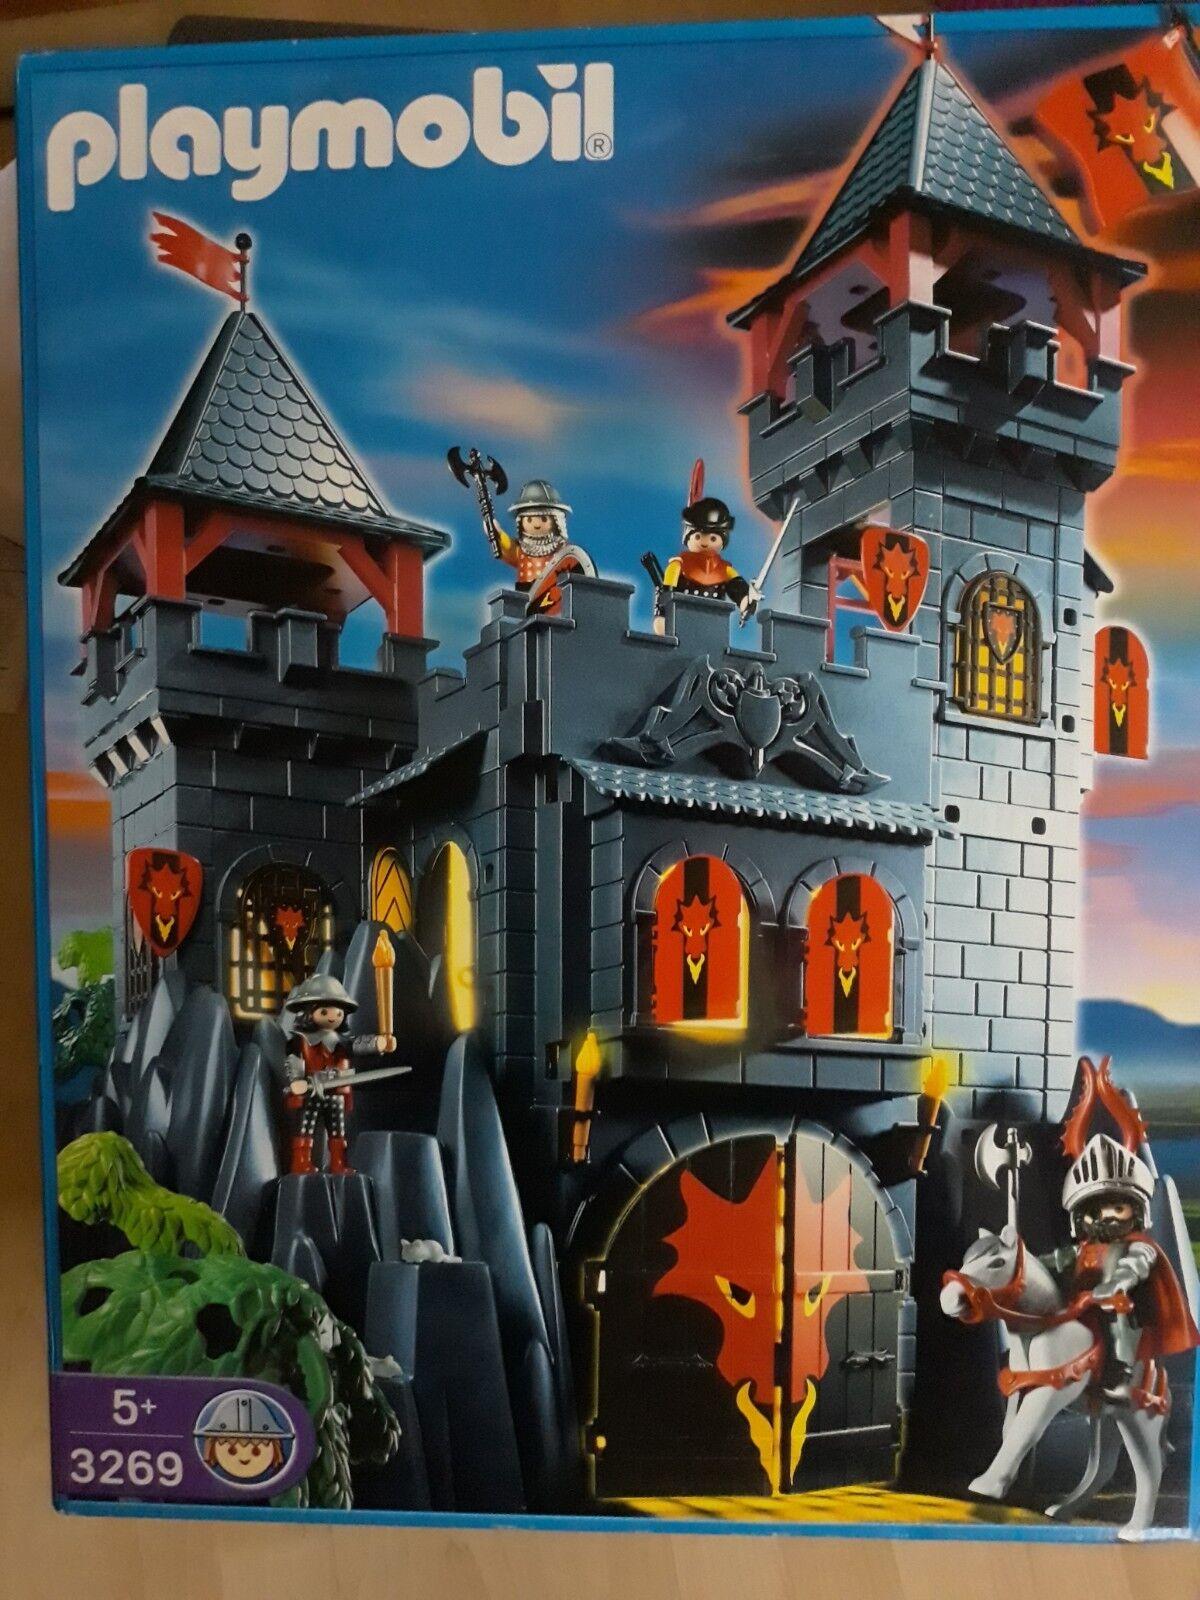 Drachenfestung 3269 Playmobil Playmobil Playmobil    Große Auswahl  8825d1